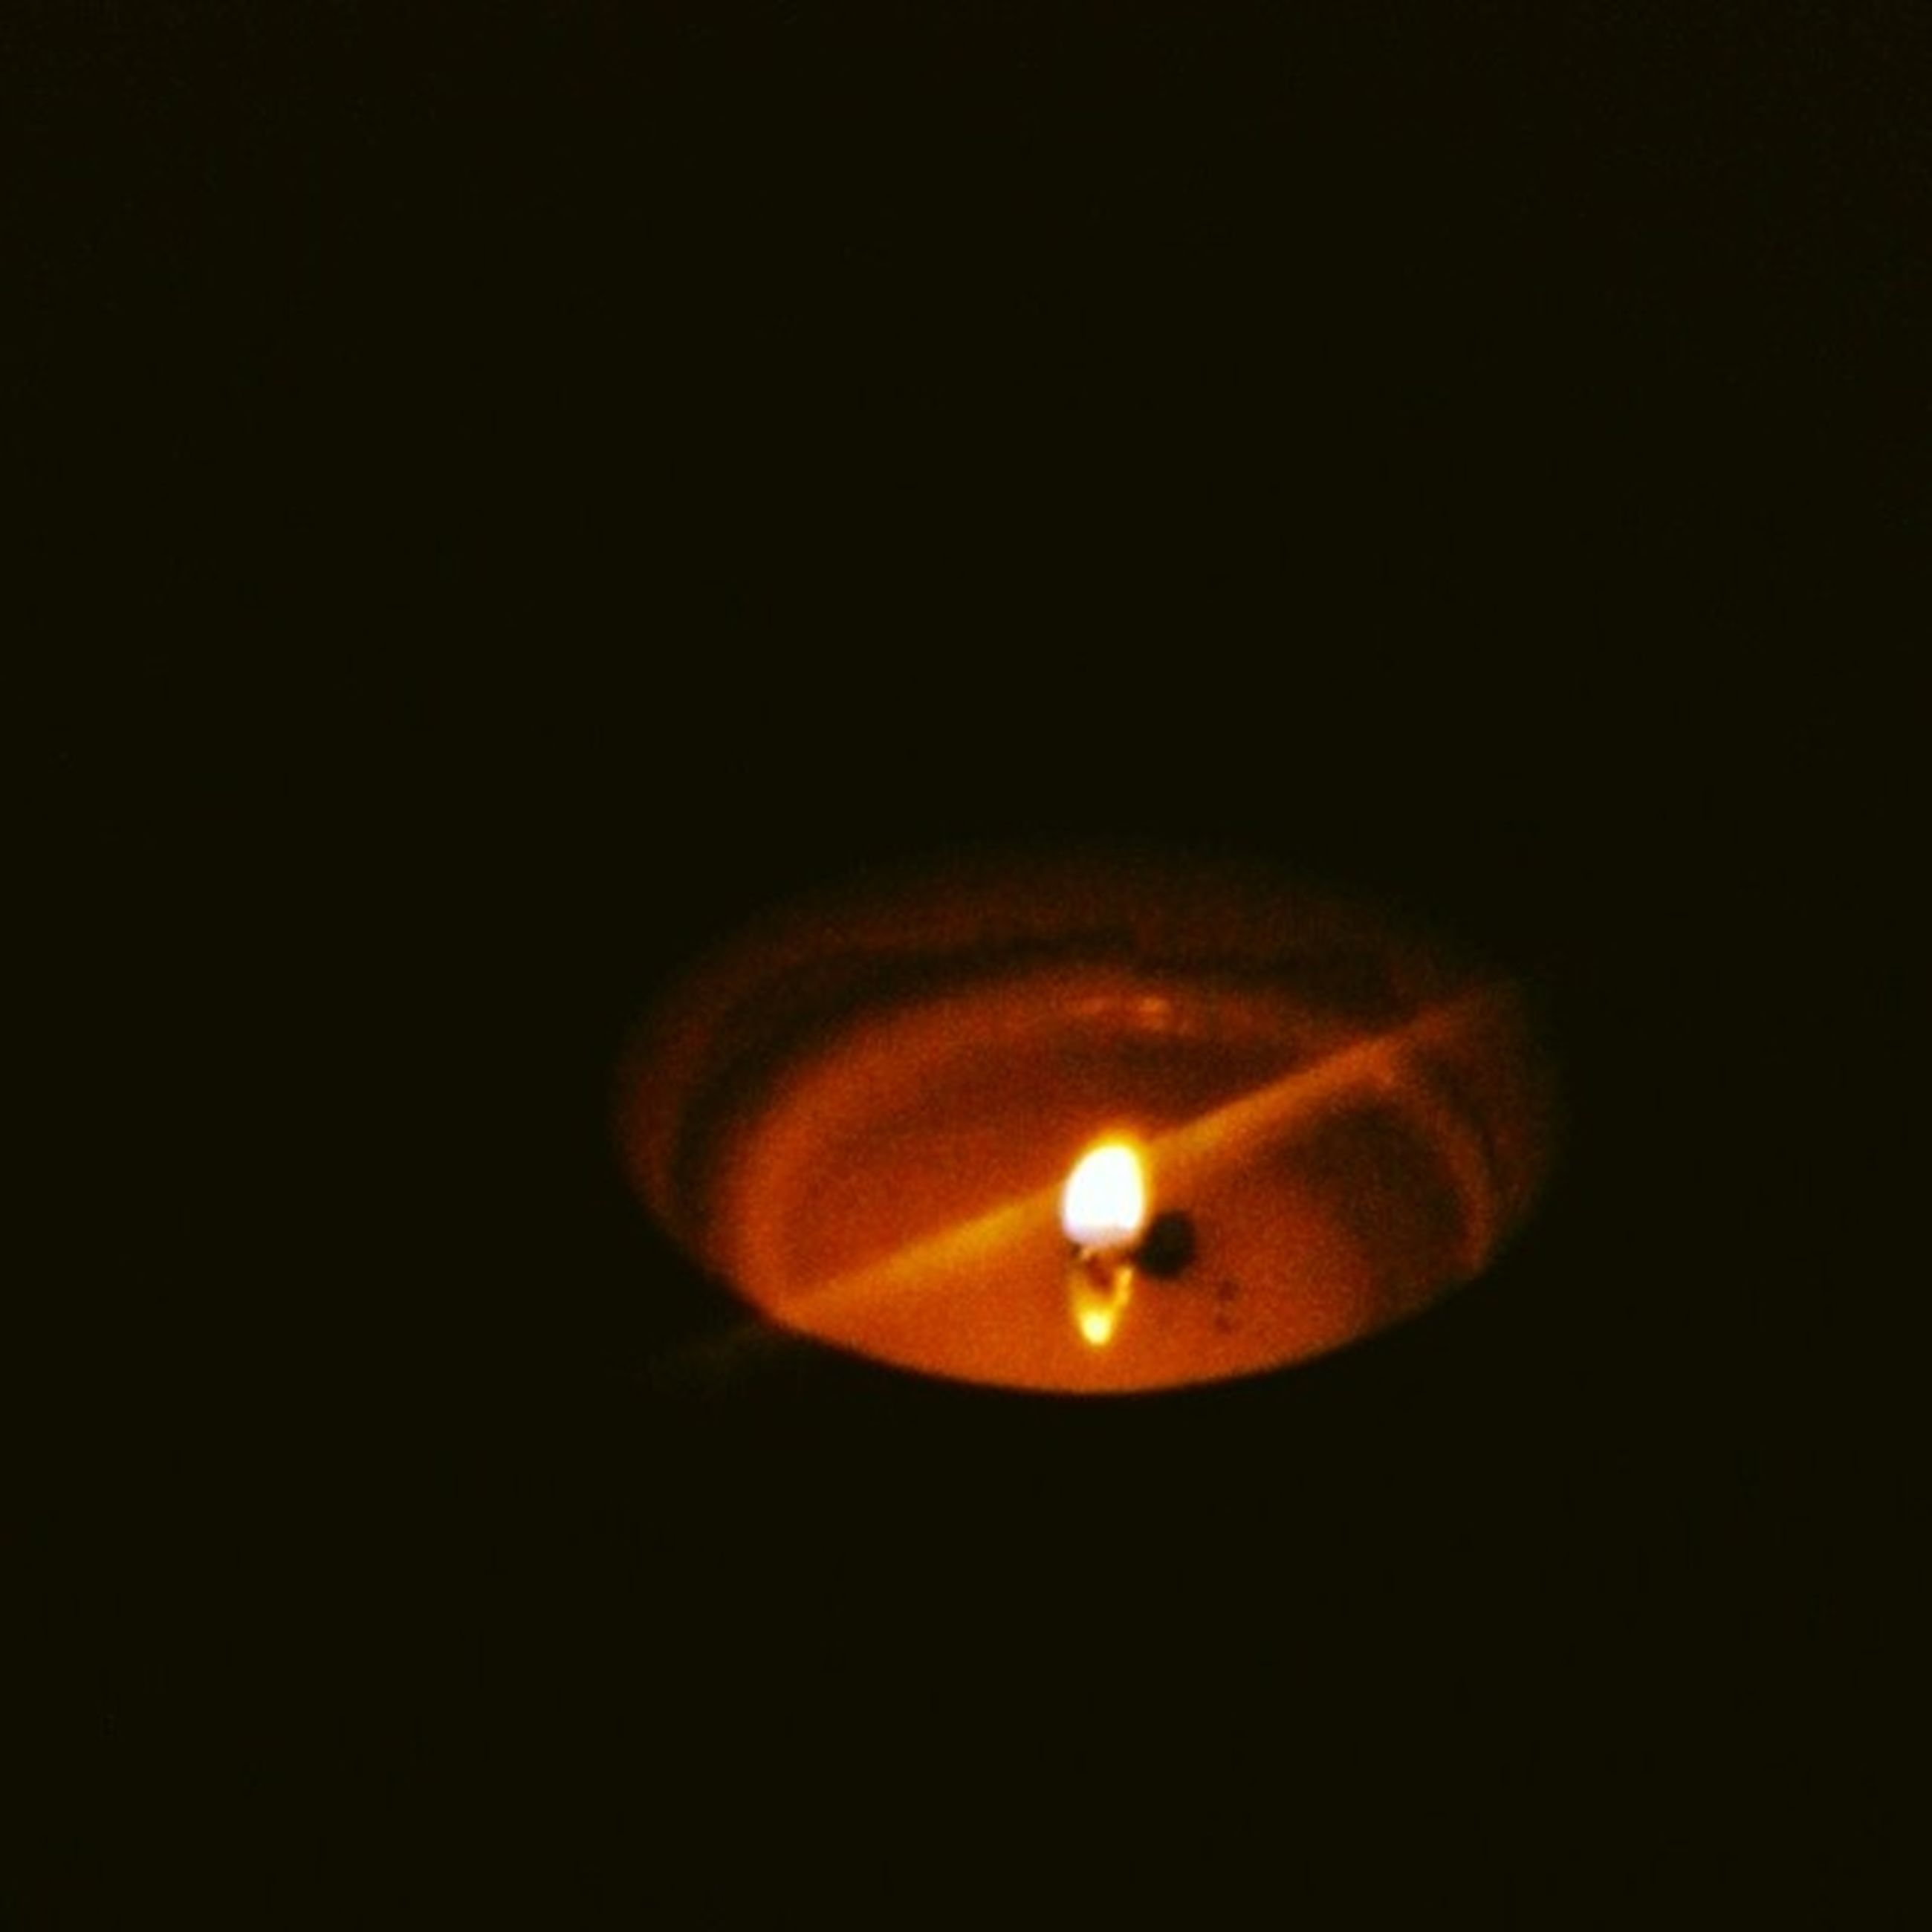 illuminated, copy space, dark, glowing, indoors, studio shot, black background, lighting equipment, lit, darkroom, night, burning, electricity, flame, close-up, light bulb, candle, light - natural phenomenon, light, heat - temperature